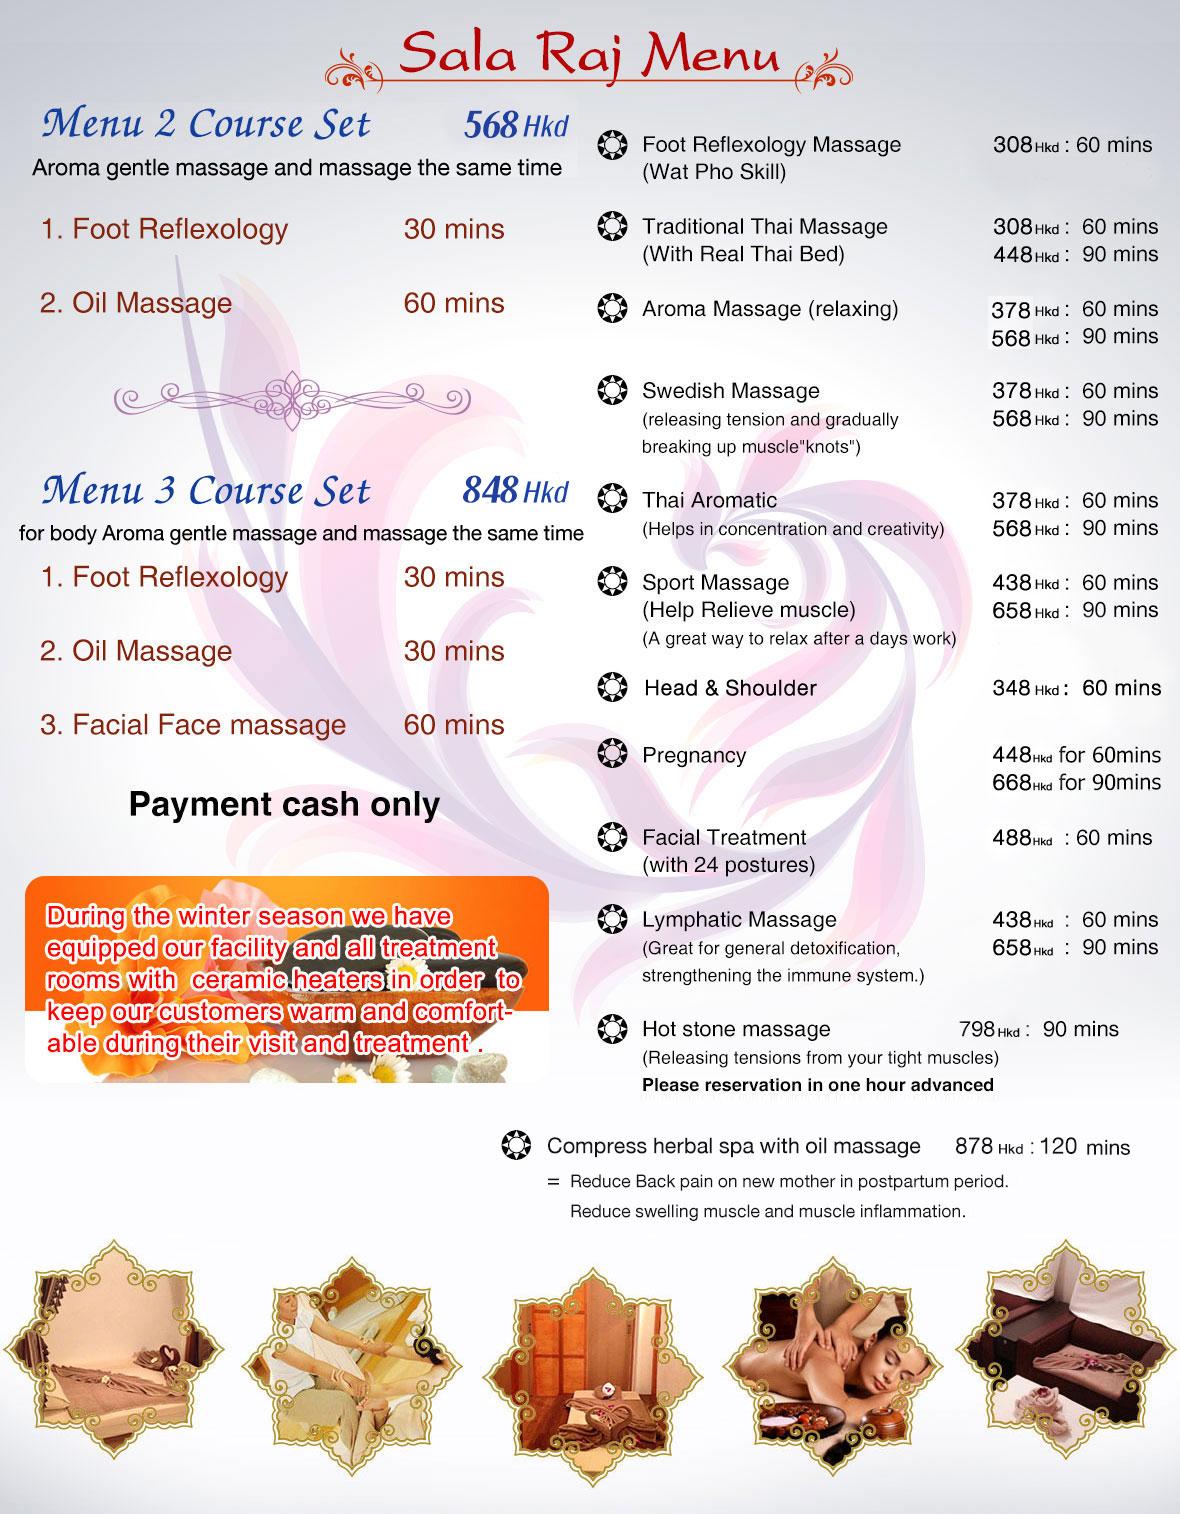 salaraj-menu-2019